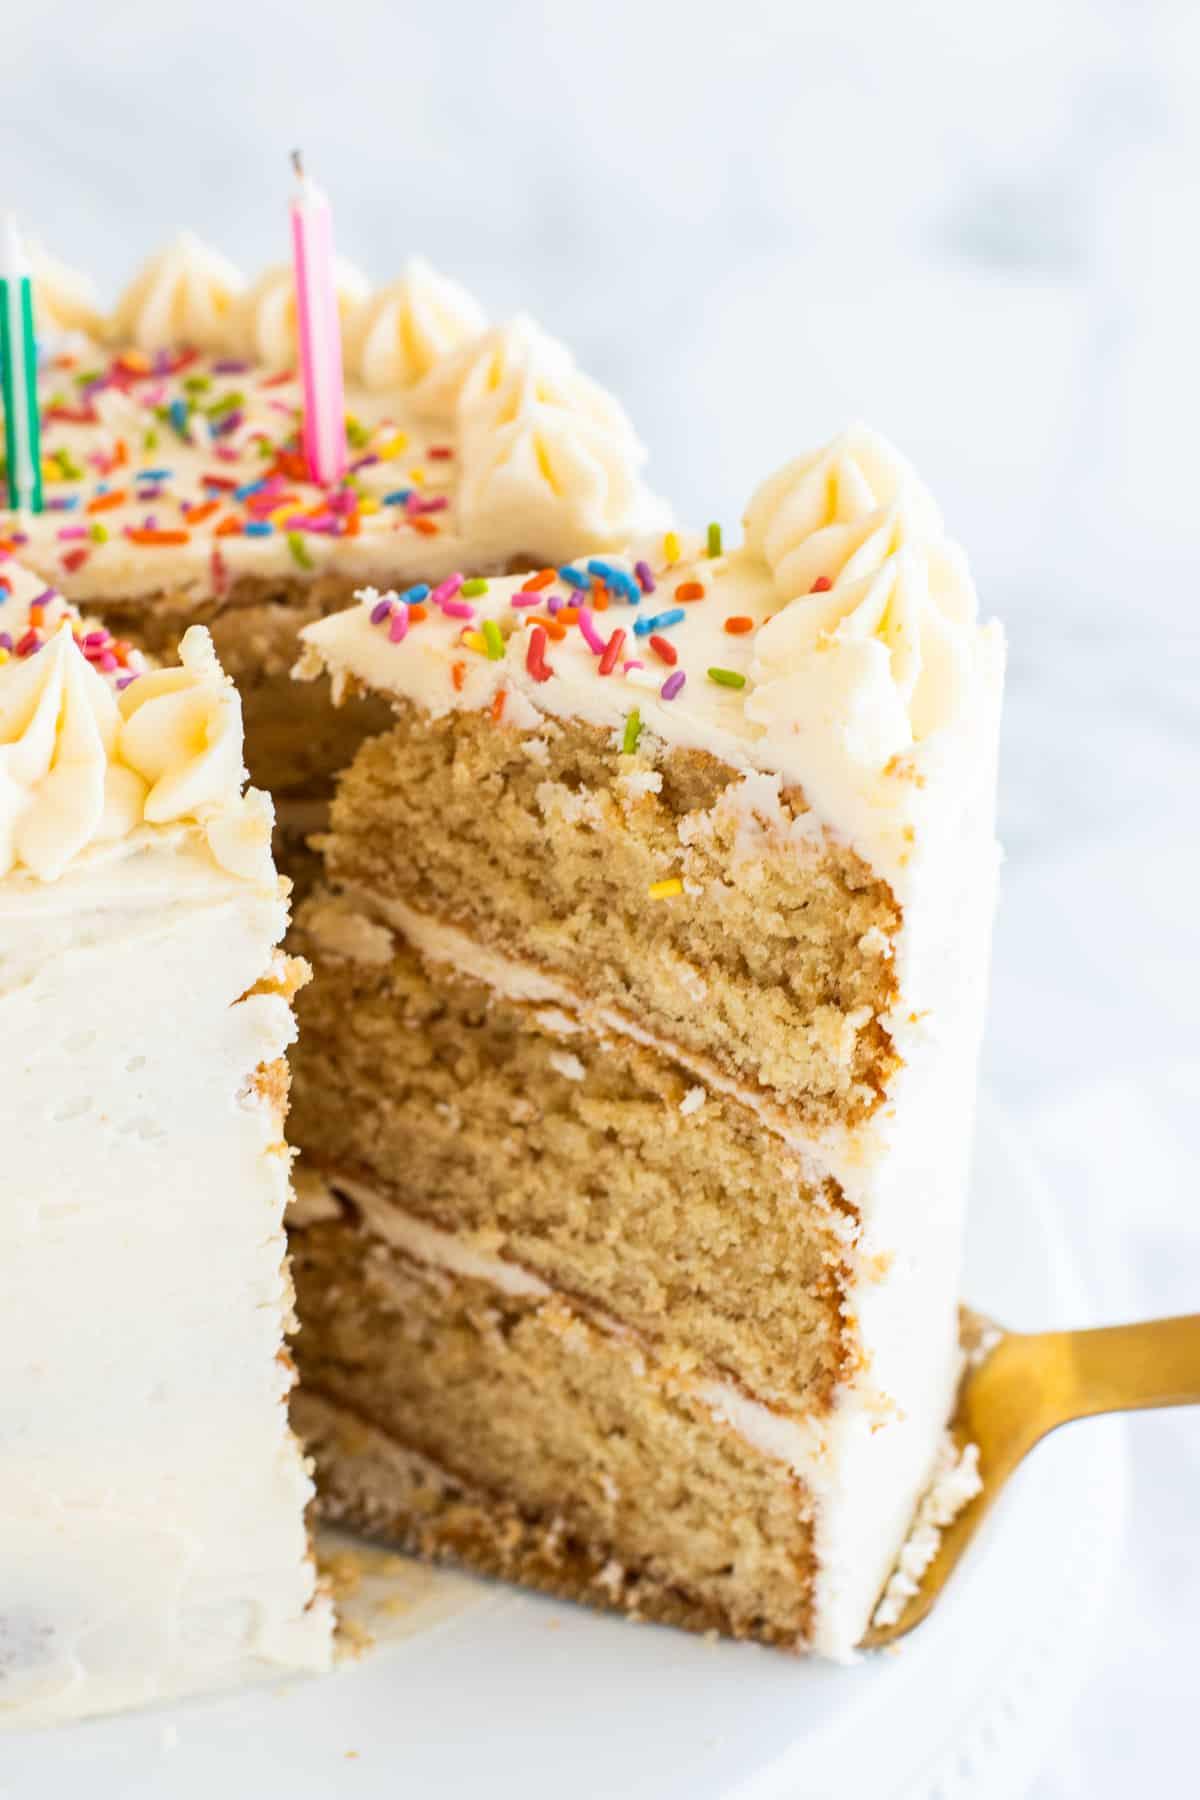 a slice of vegan vanilla cake on a cake lifter